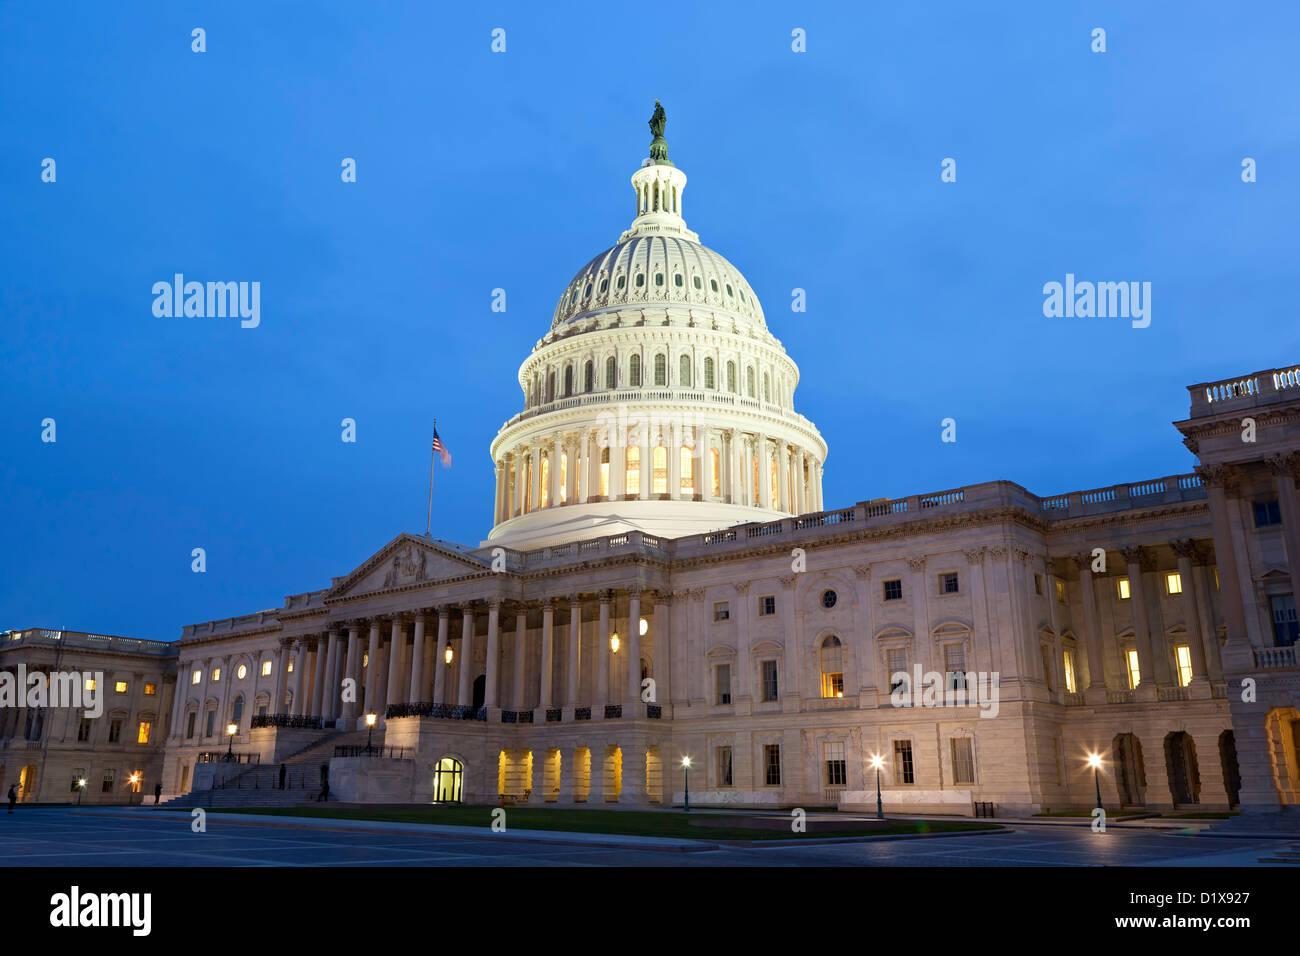 U.S. Capitol Building, Washington, DC USA - Stock Image